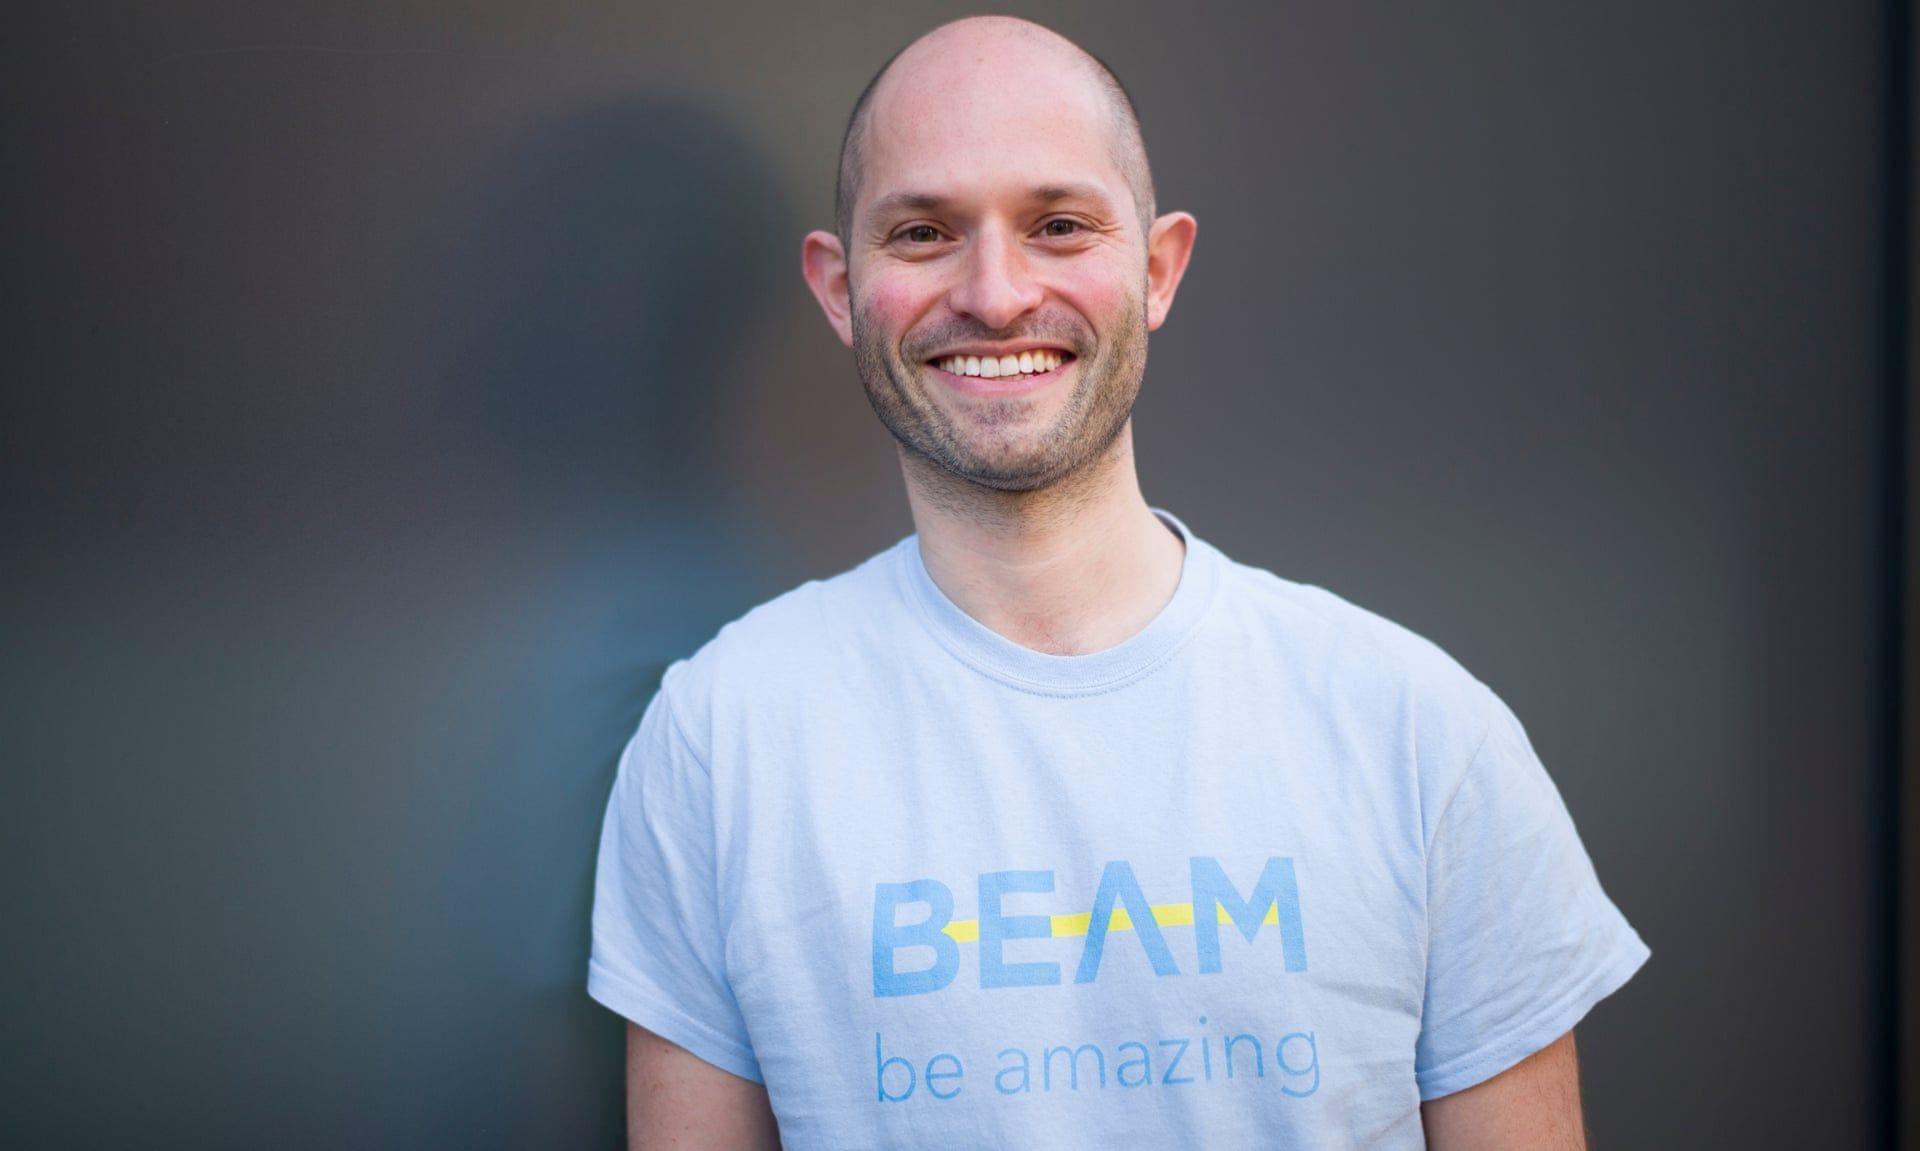 BEAM-Alex